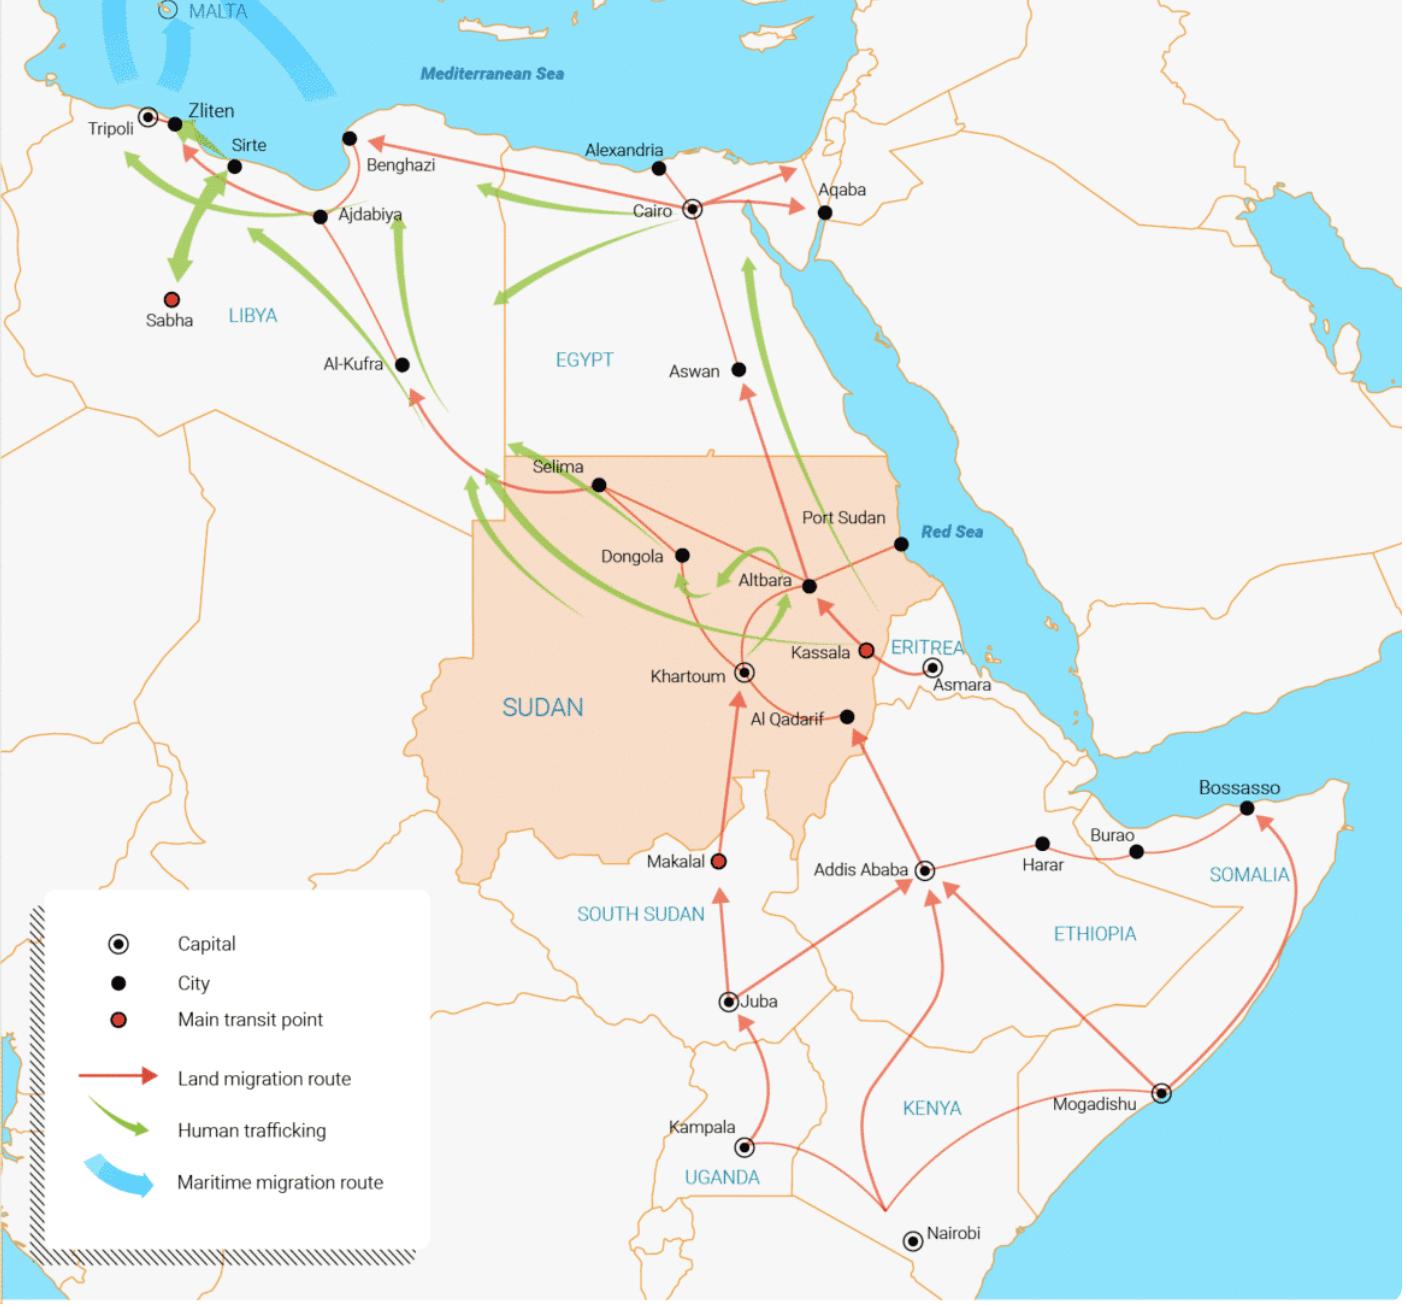 نصف مليون مهاجر يطرقون أبواب أوروبا عبر السودان